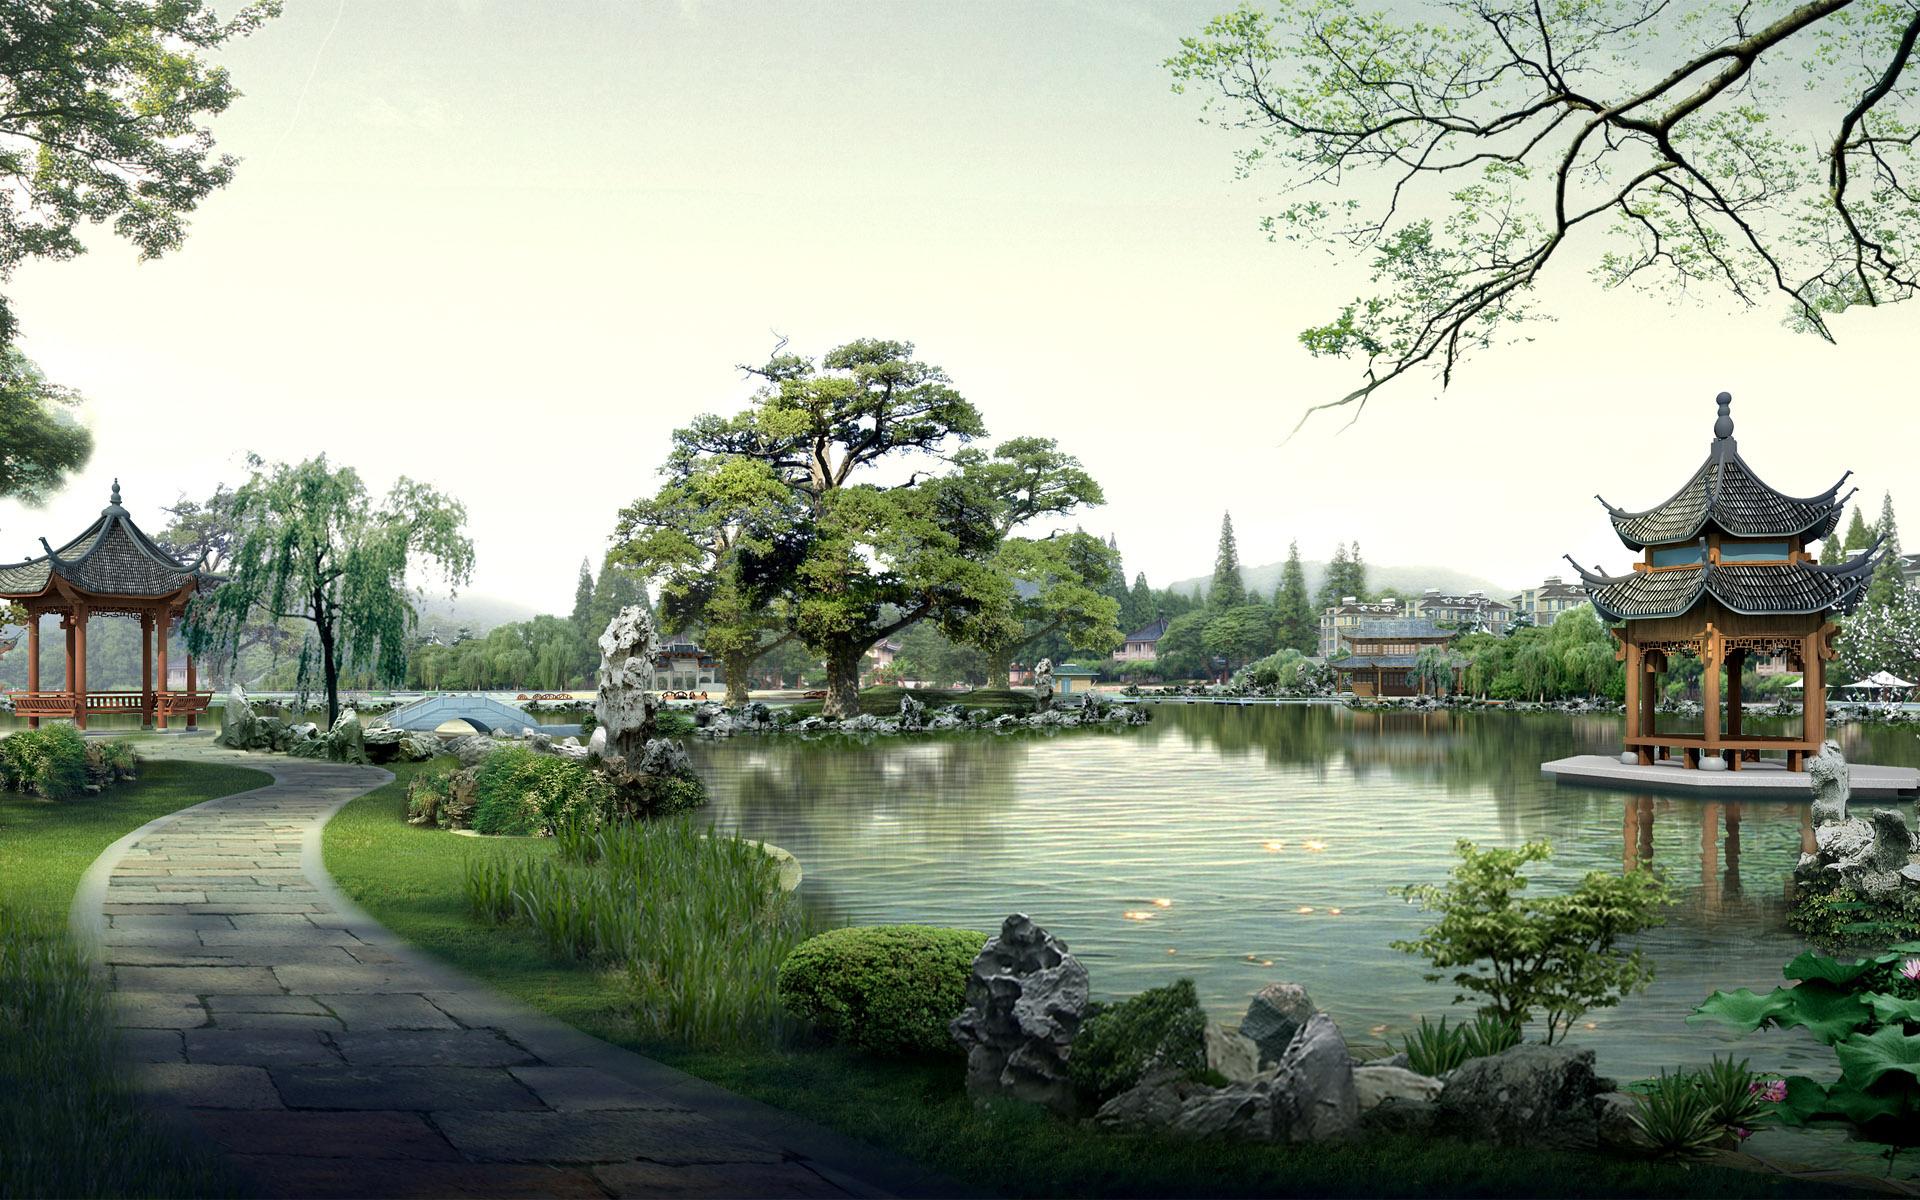 Japanese garden wallpaper - Japanese Garden Wallpapers Wallpaper Wallpaper Hd Background